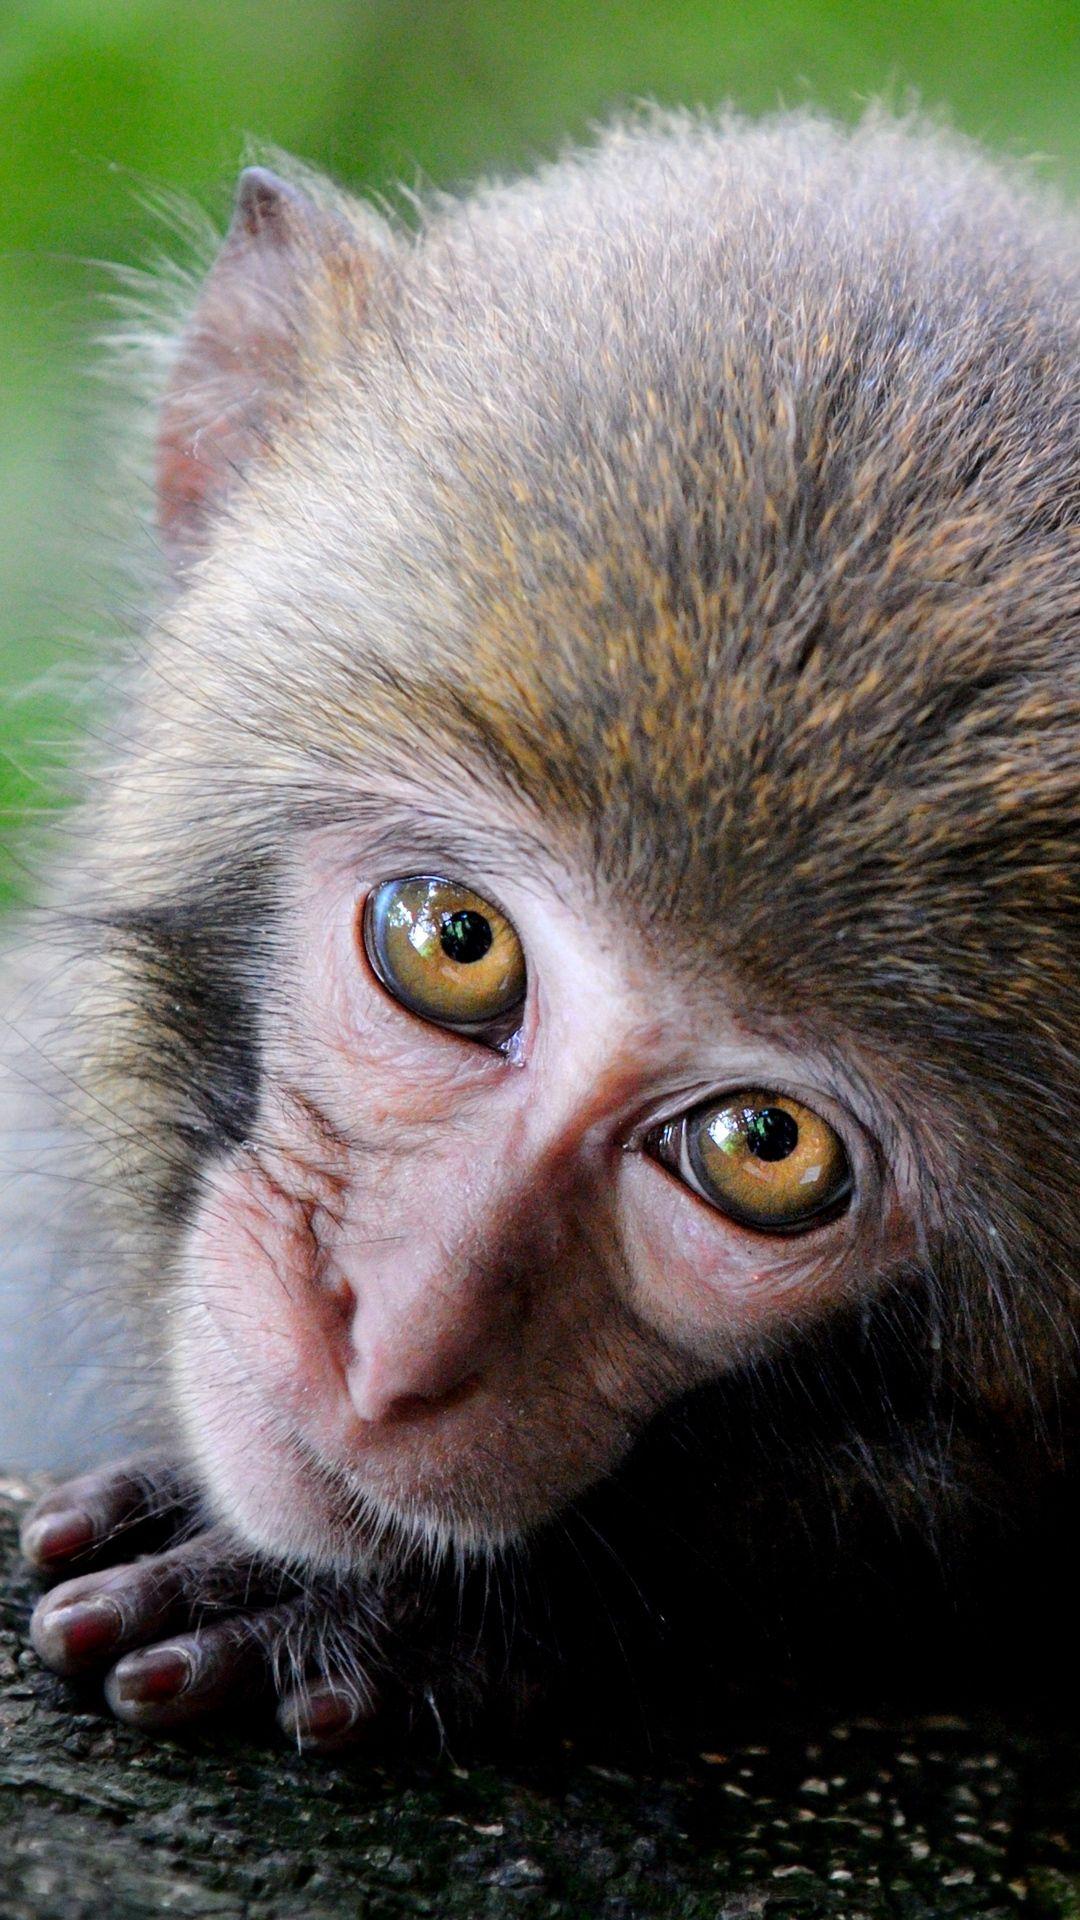 Cute Monkey Photo